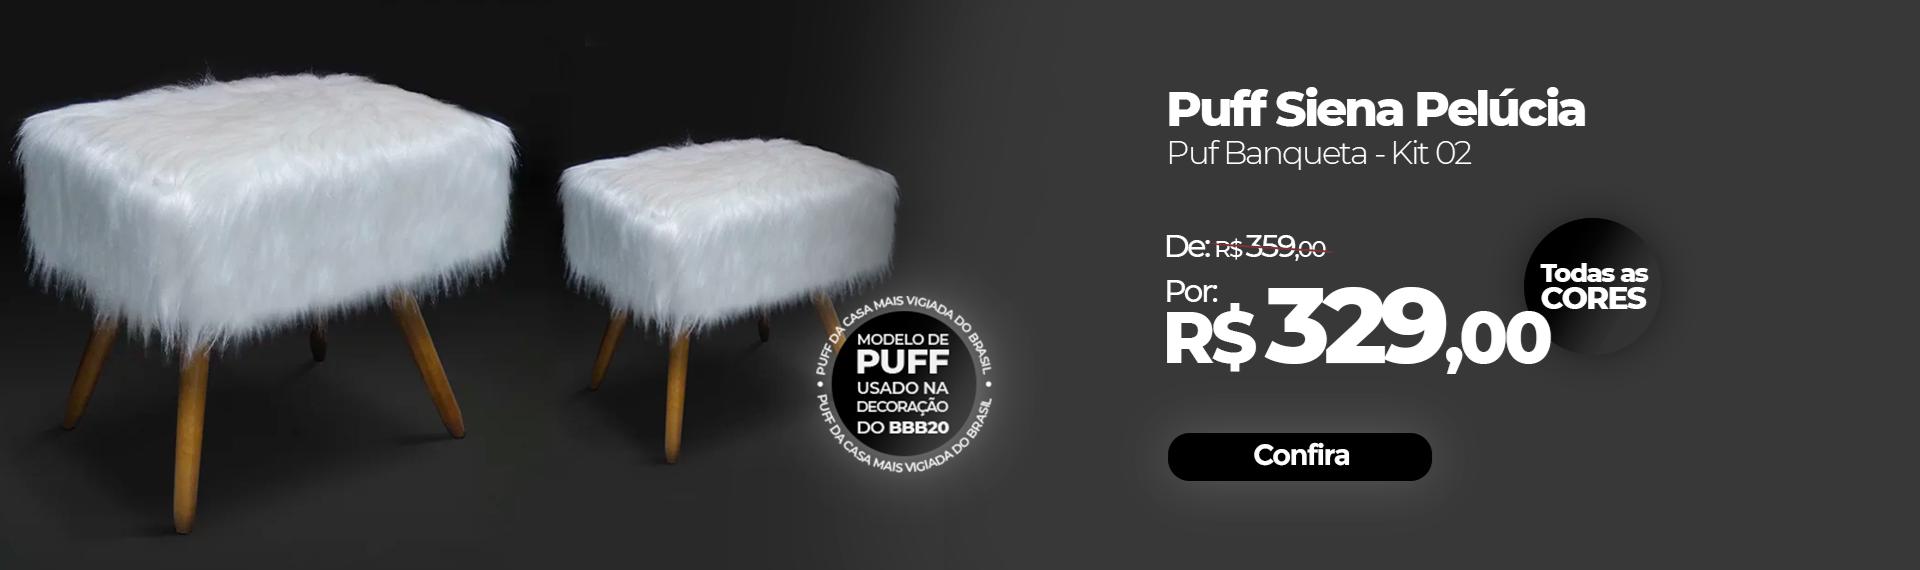 Kit 02 Puff Salaone